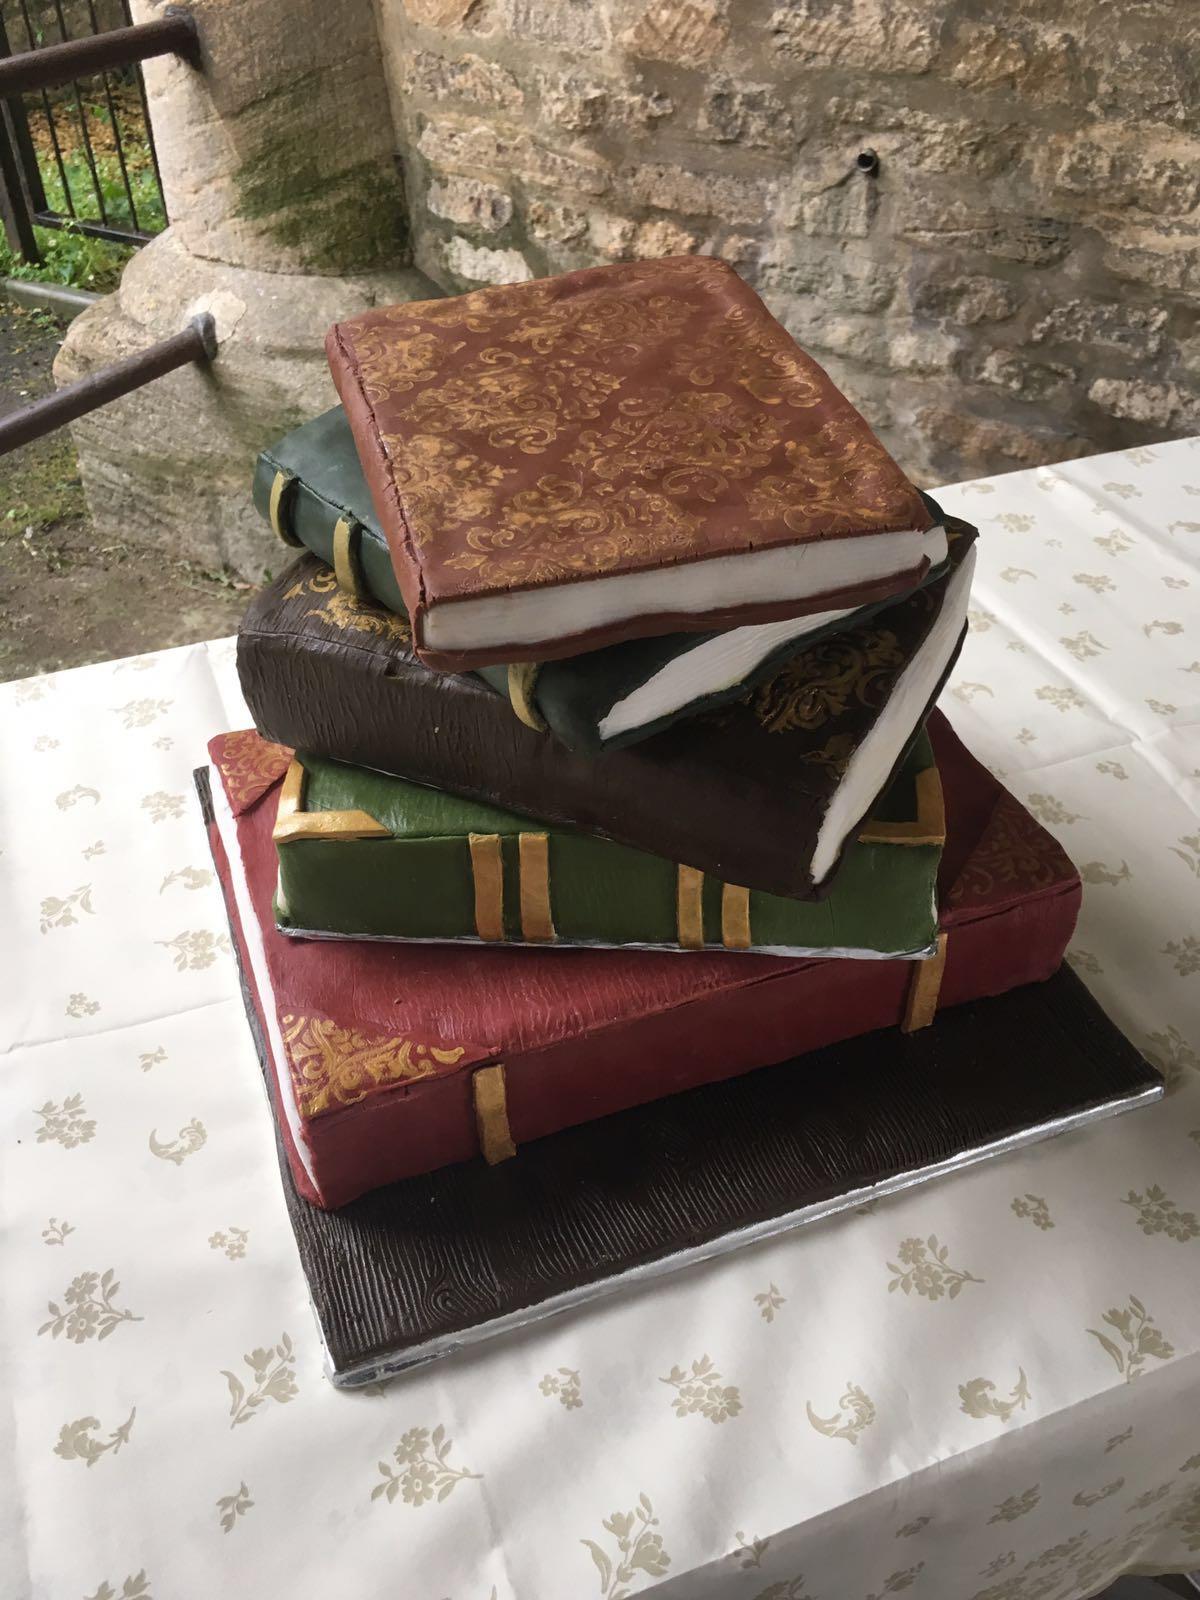 Antique Books Wedding Cake